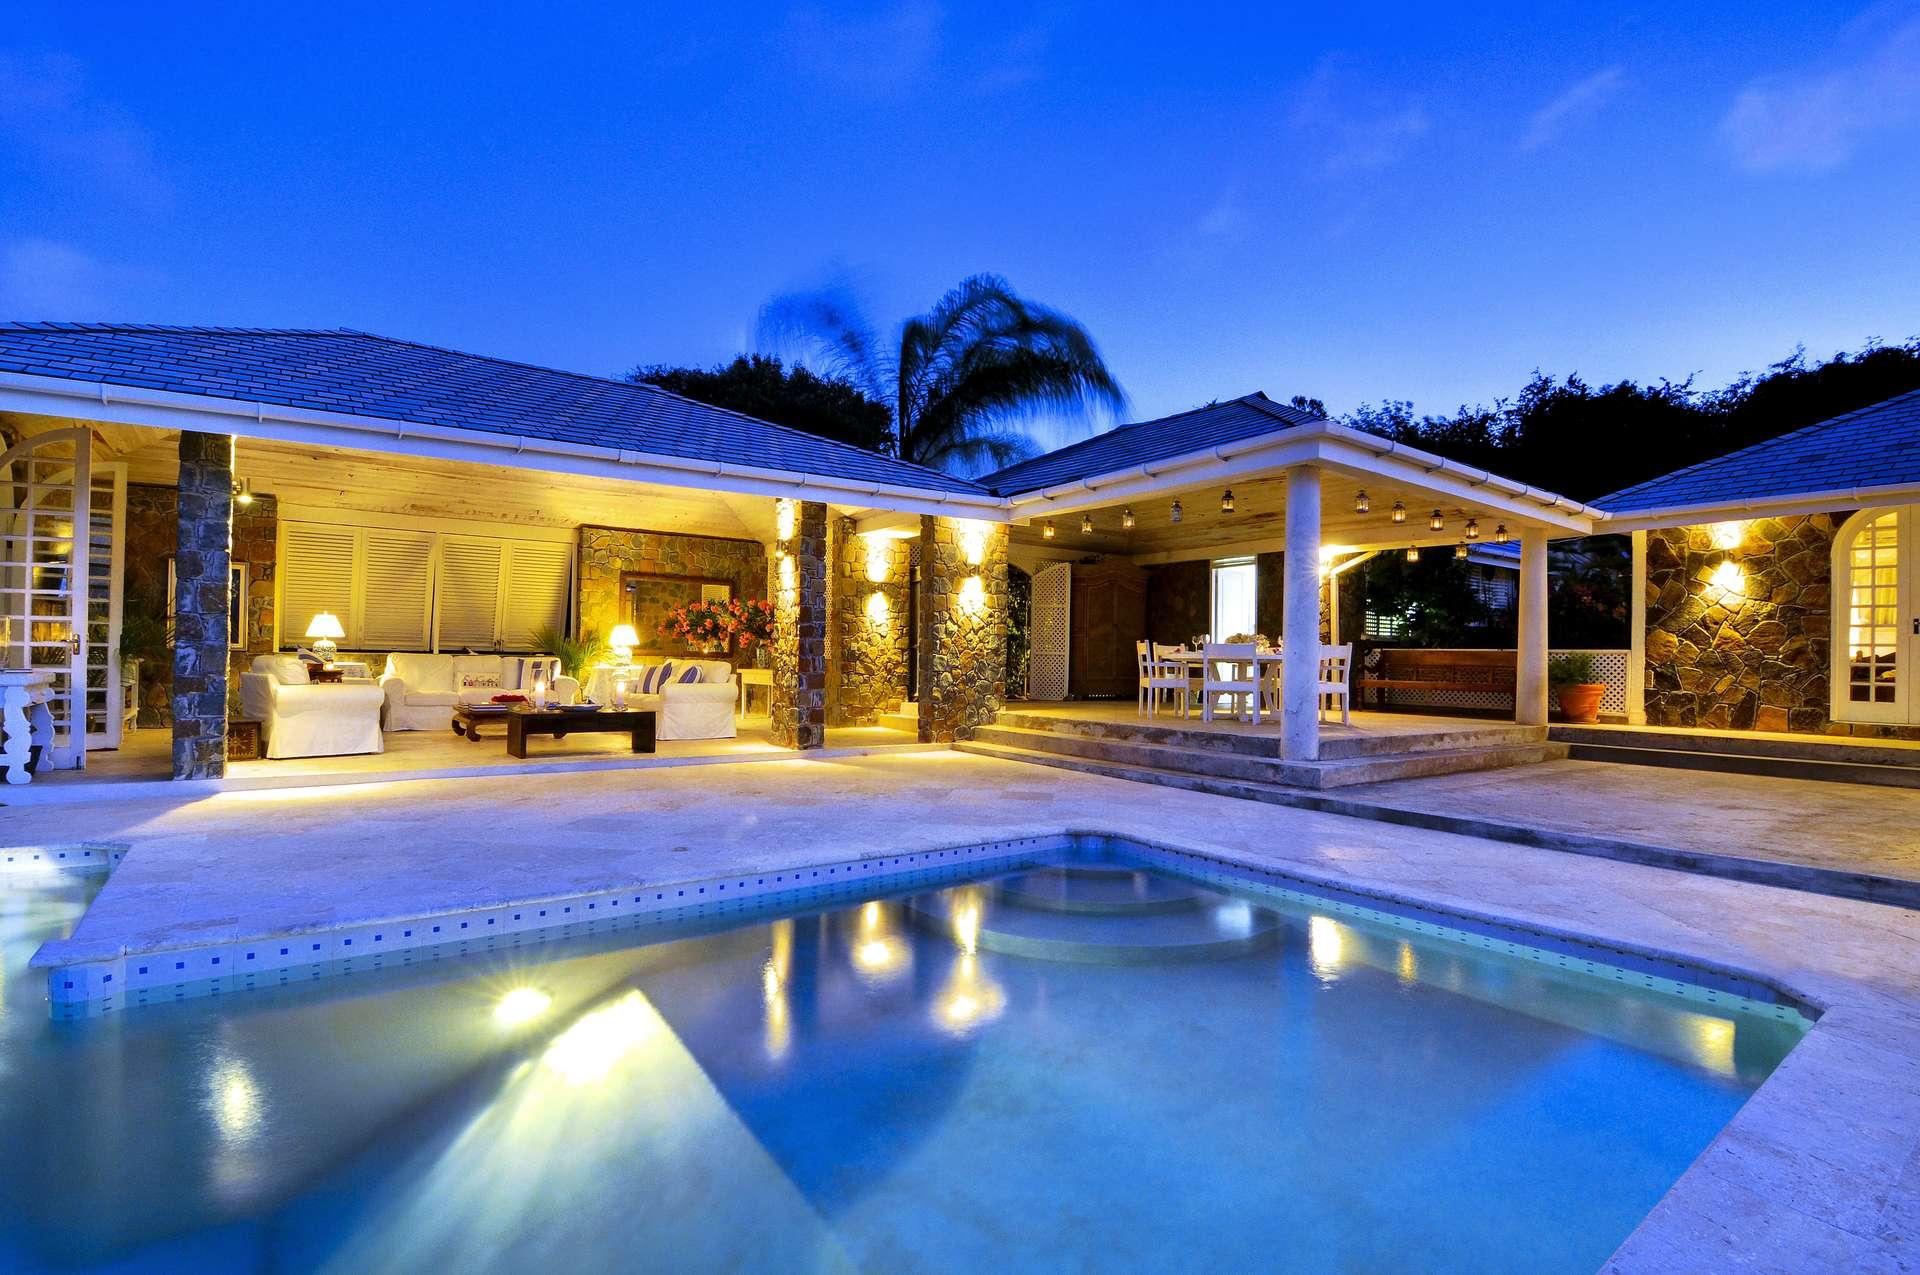 Luxury villa rentals caribbean - St vincent and the grenadines - St vincent - Mustique - Baliceaux - Image 1/13